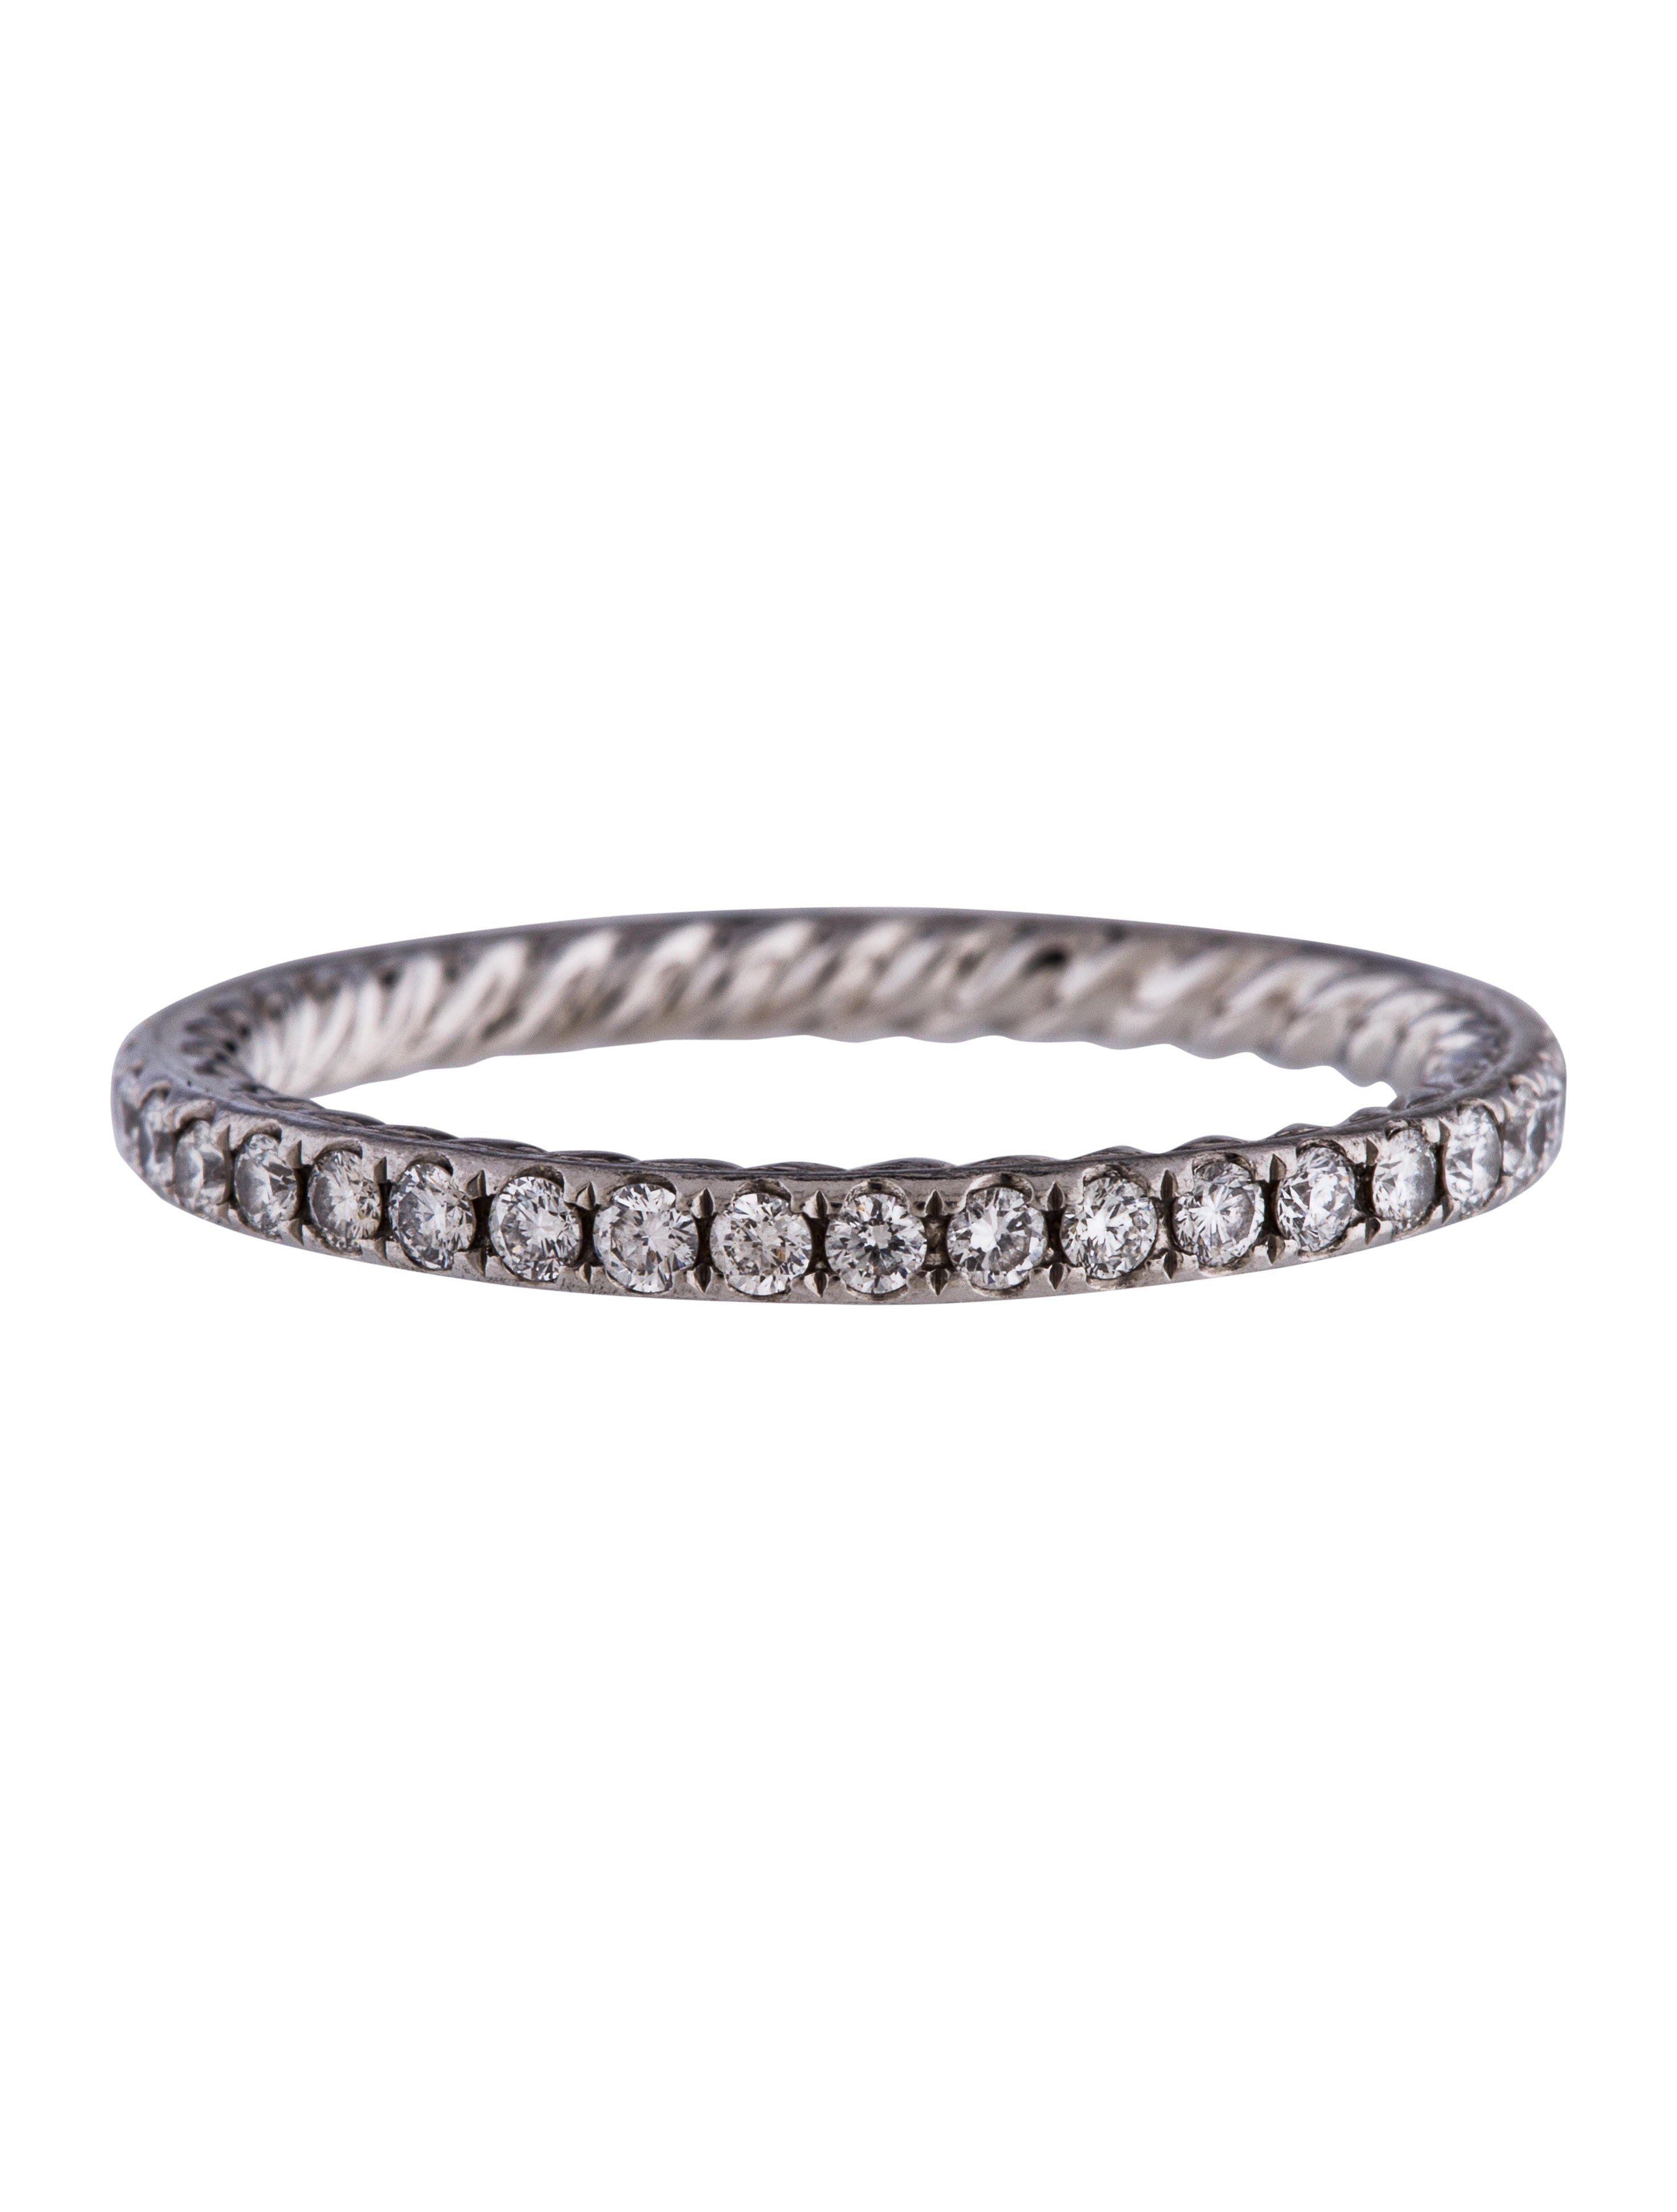 Platinum diamond eden single row wedding band gift ideas